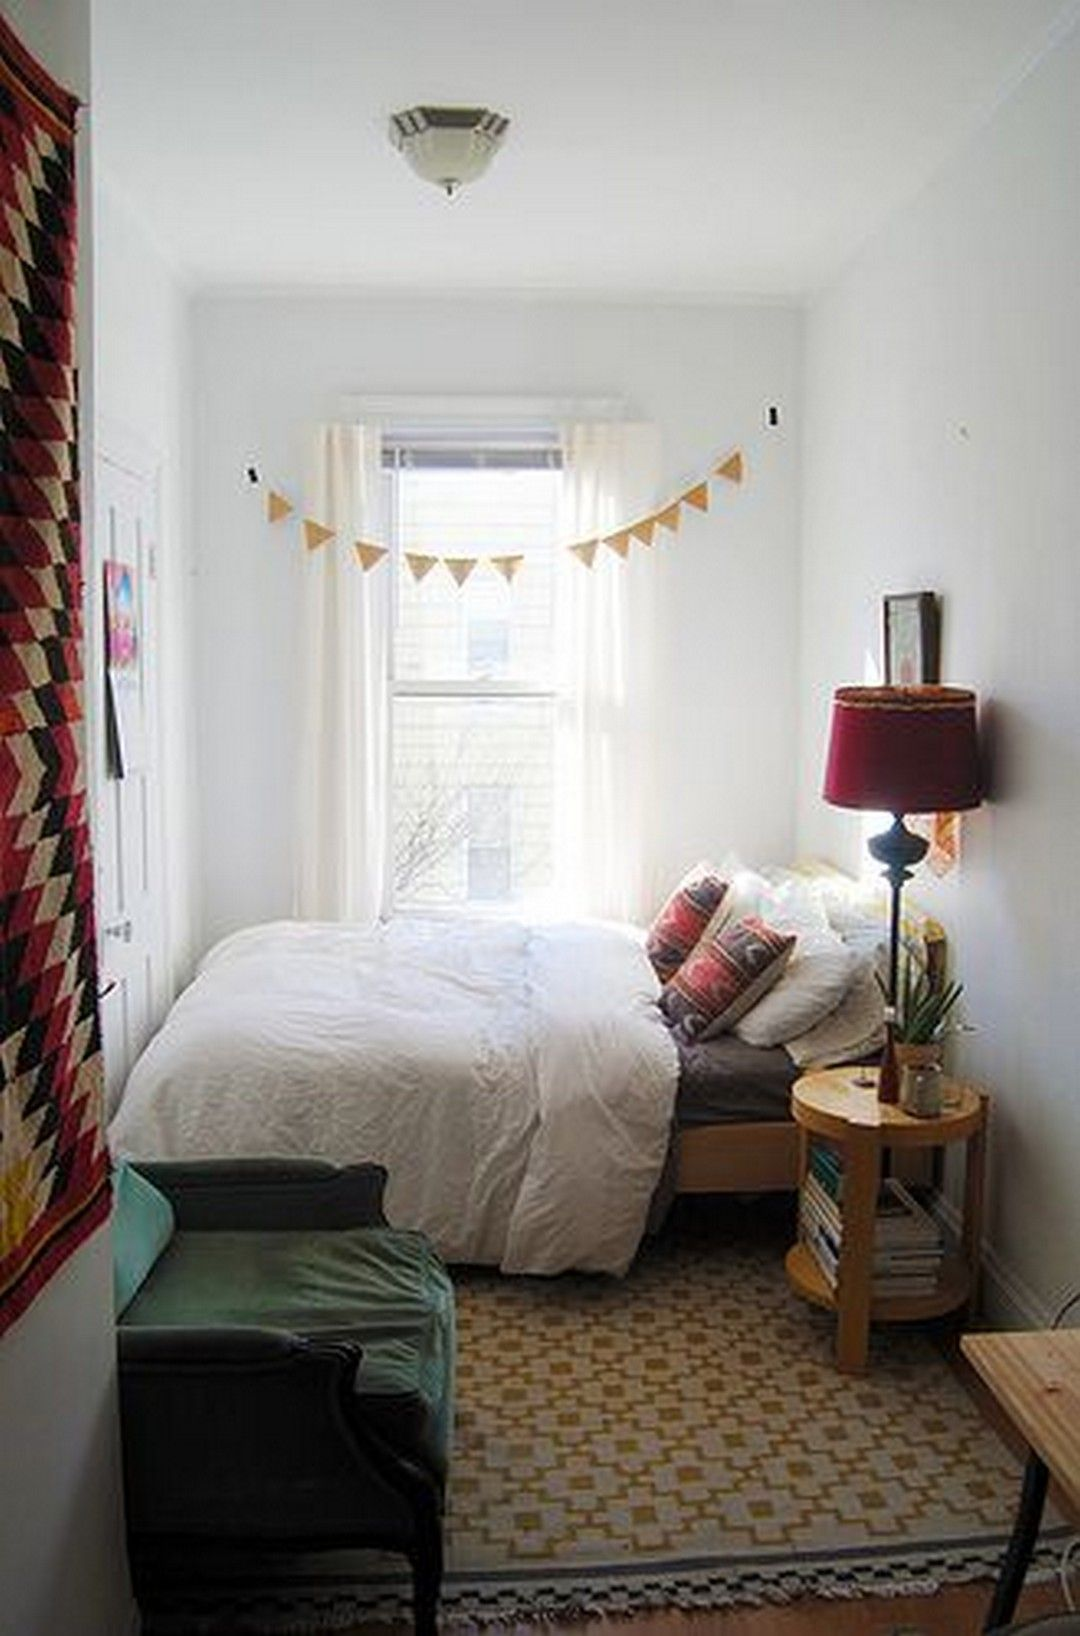 92 Elegant Cozy Bedroom Ideas With Small Spaces